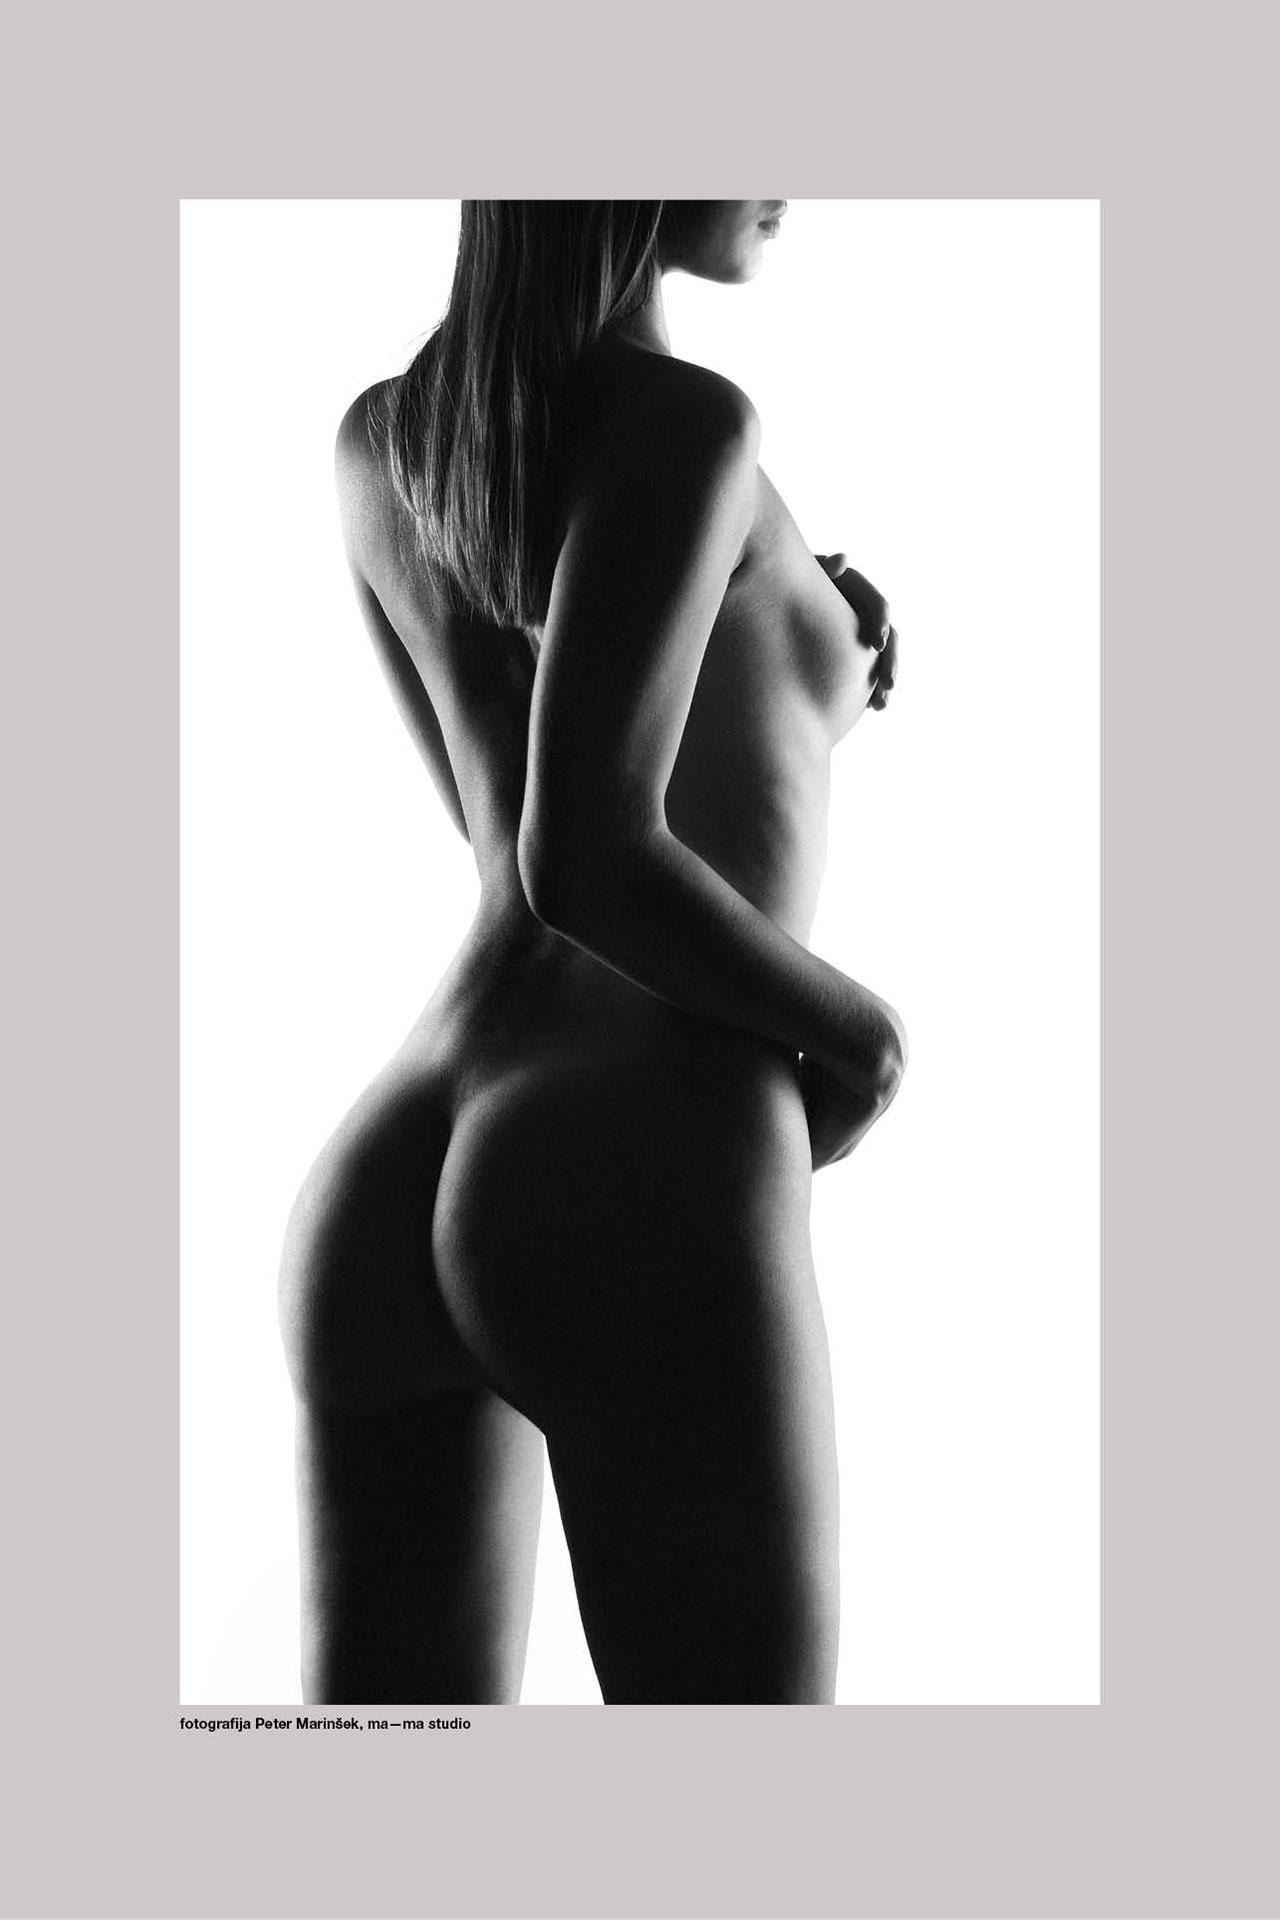 elastomeri_peter_marinsek_fotografija_studio_ma-ma4